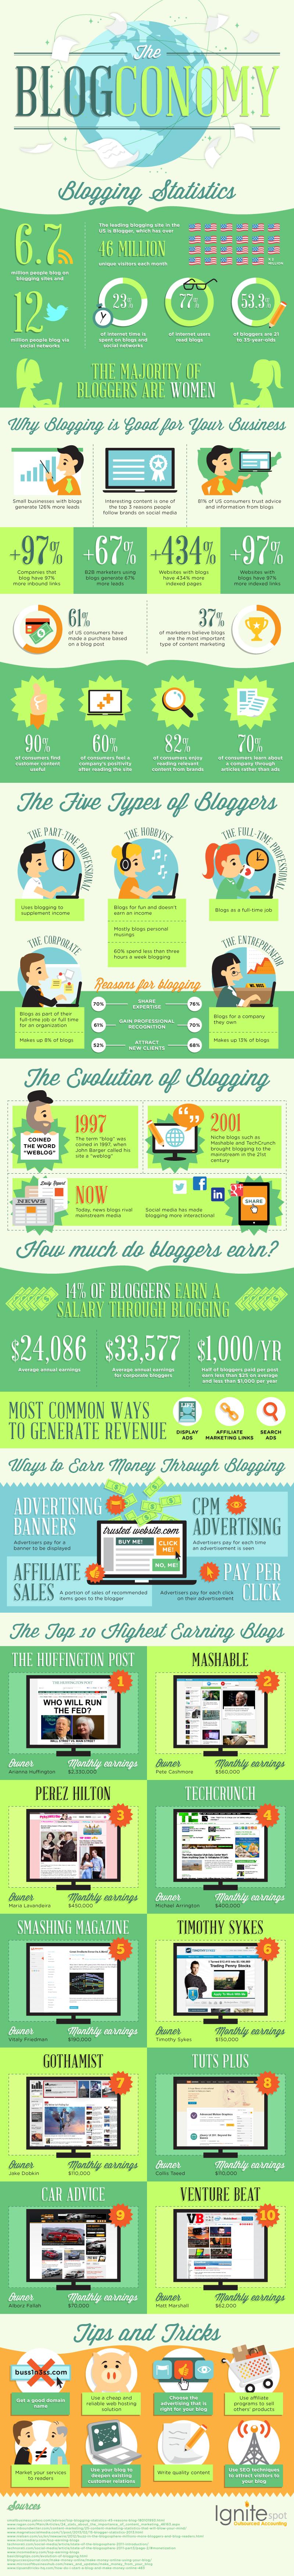 Blogging Industry Trends